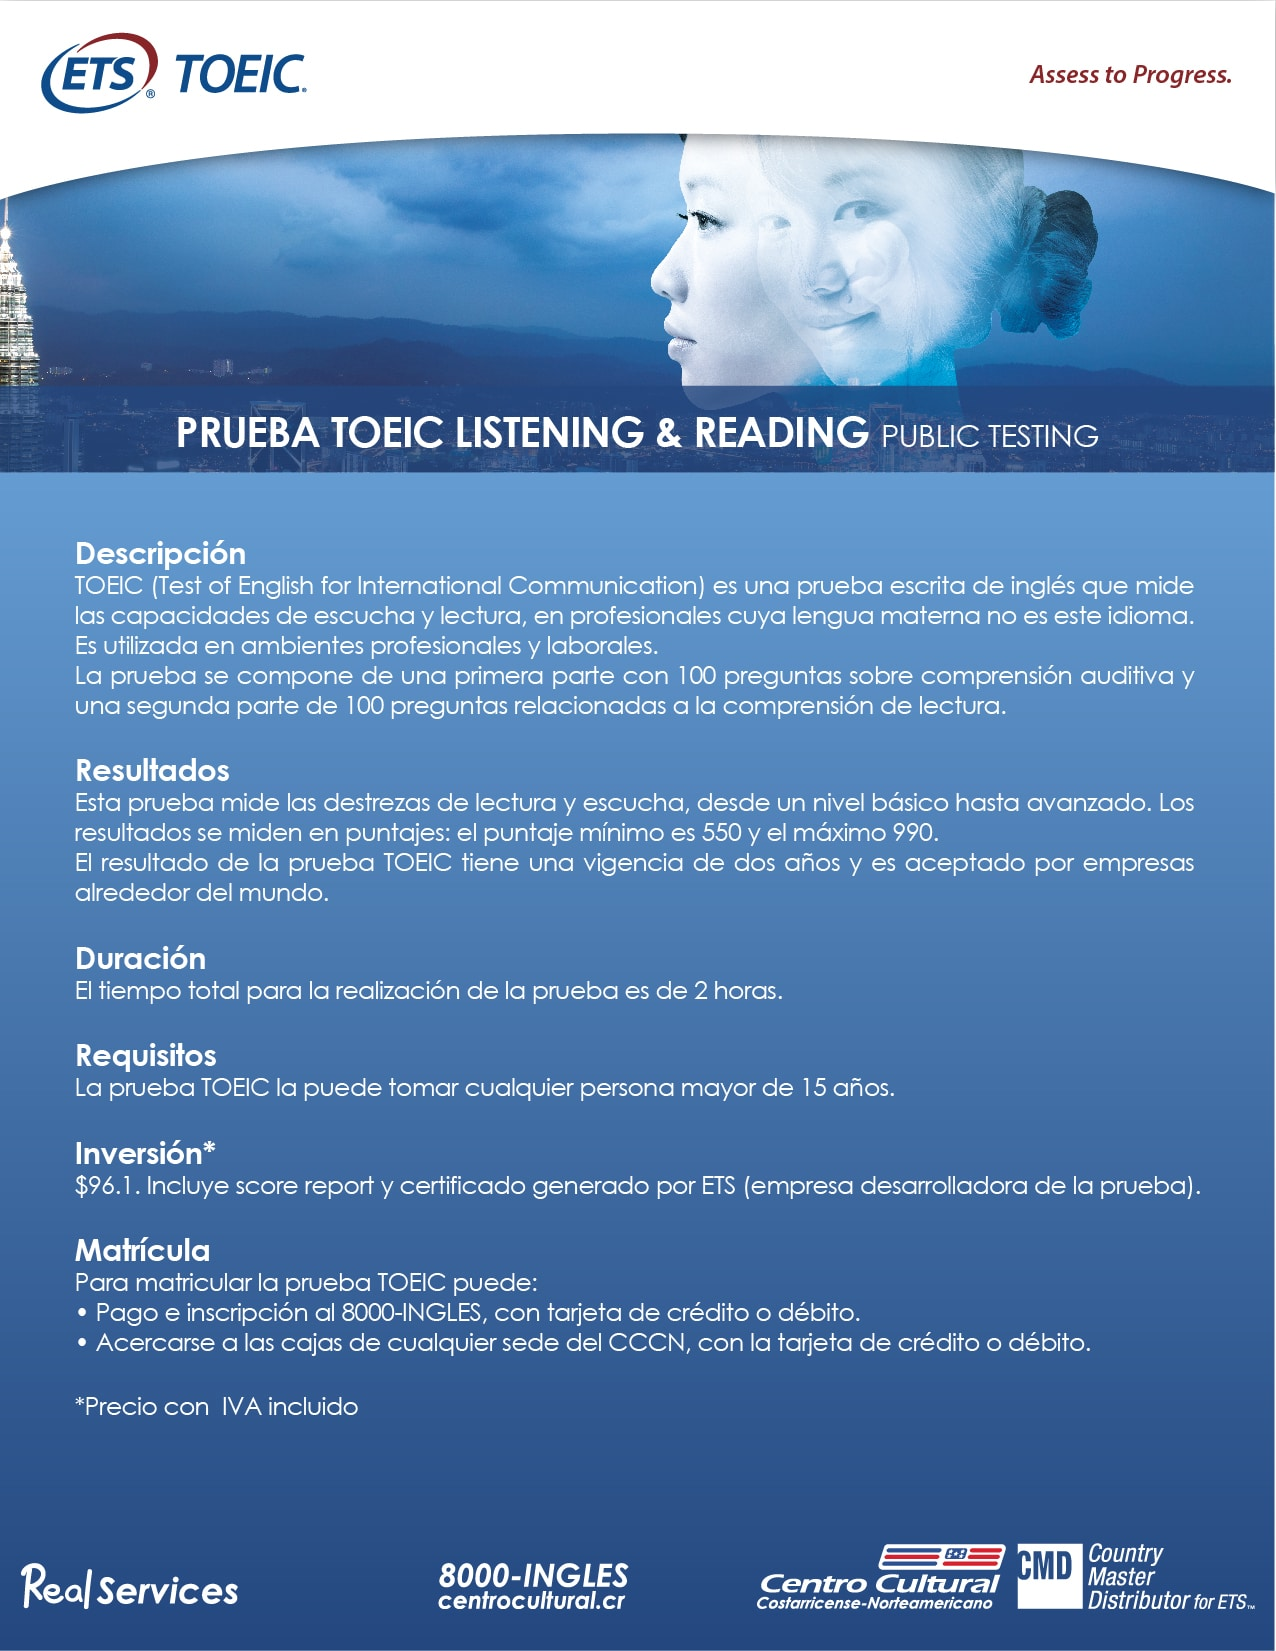 FICHA PRUEBA TOEIC L&R PUBLIC TESTING